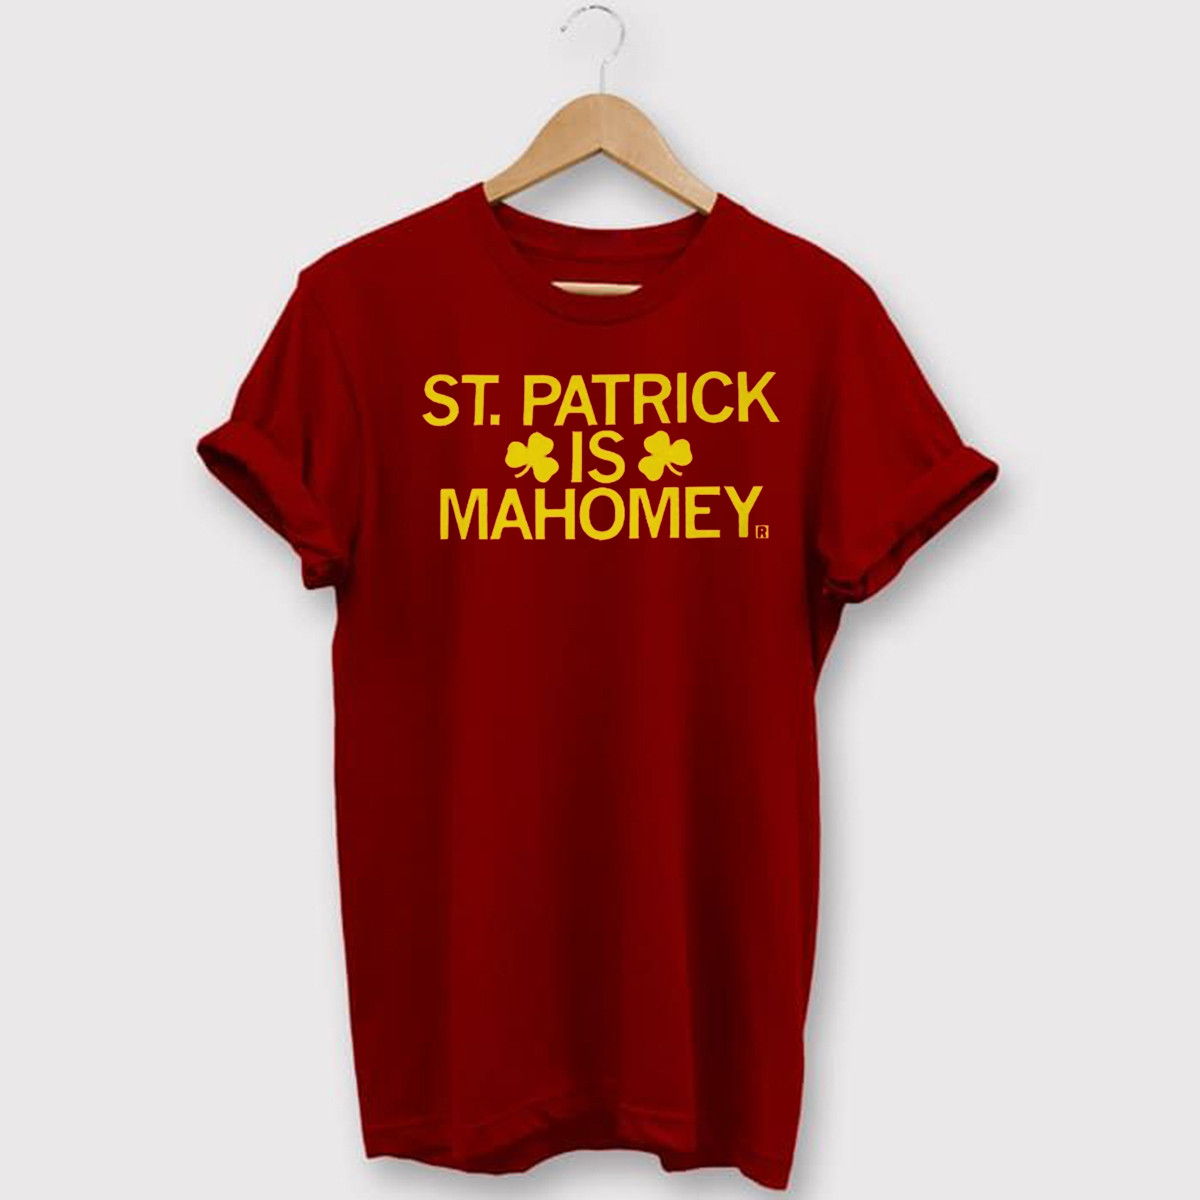 ST. PATRICK IS MAHOMEY Patrick Mahomes Shirt